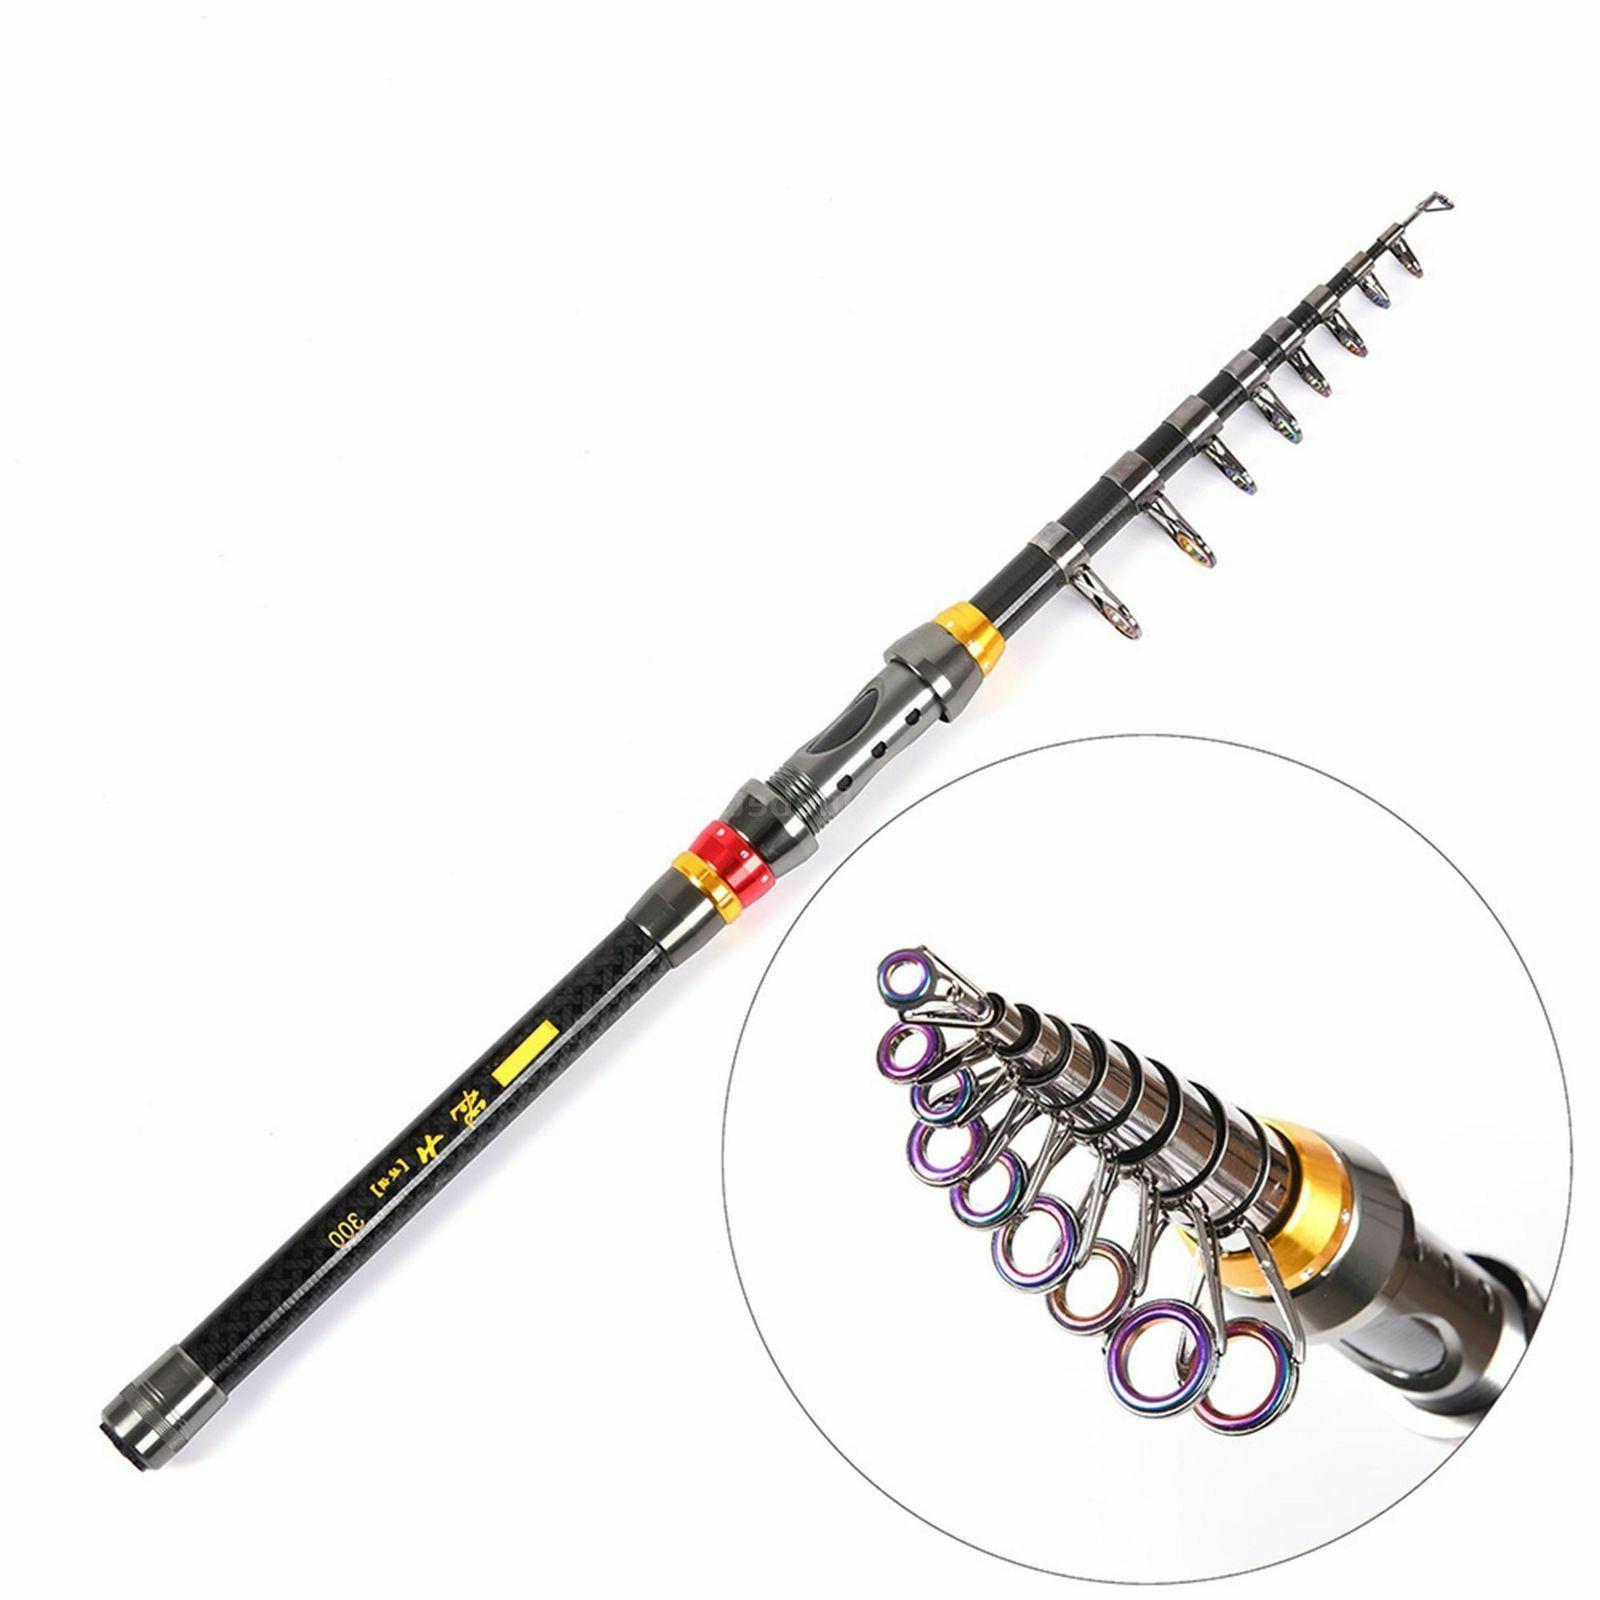 US Fiber Rod Pole Spinning Tackle P1A6